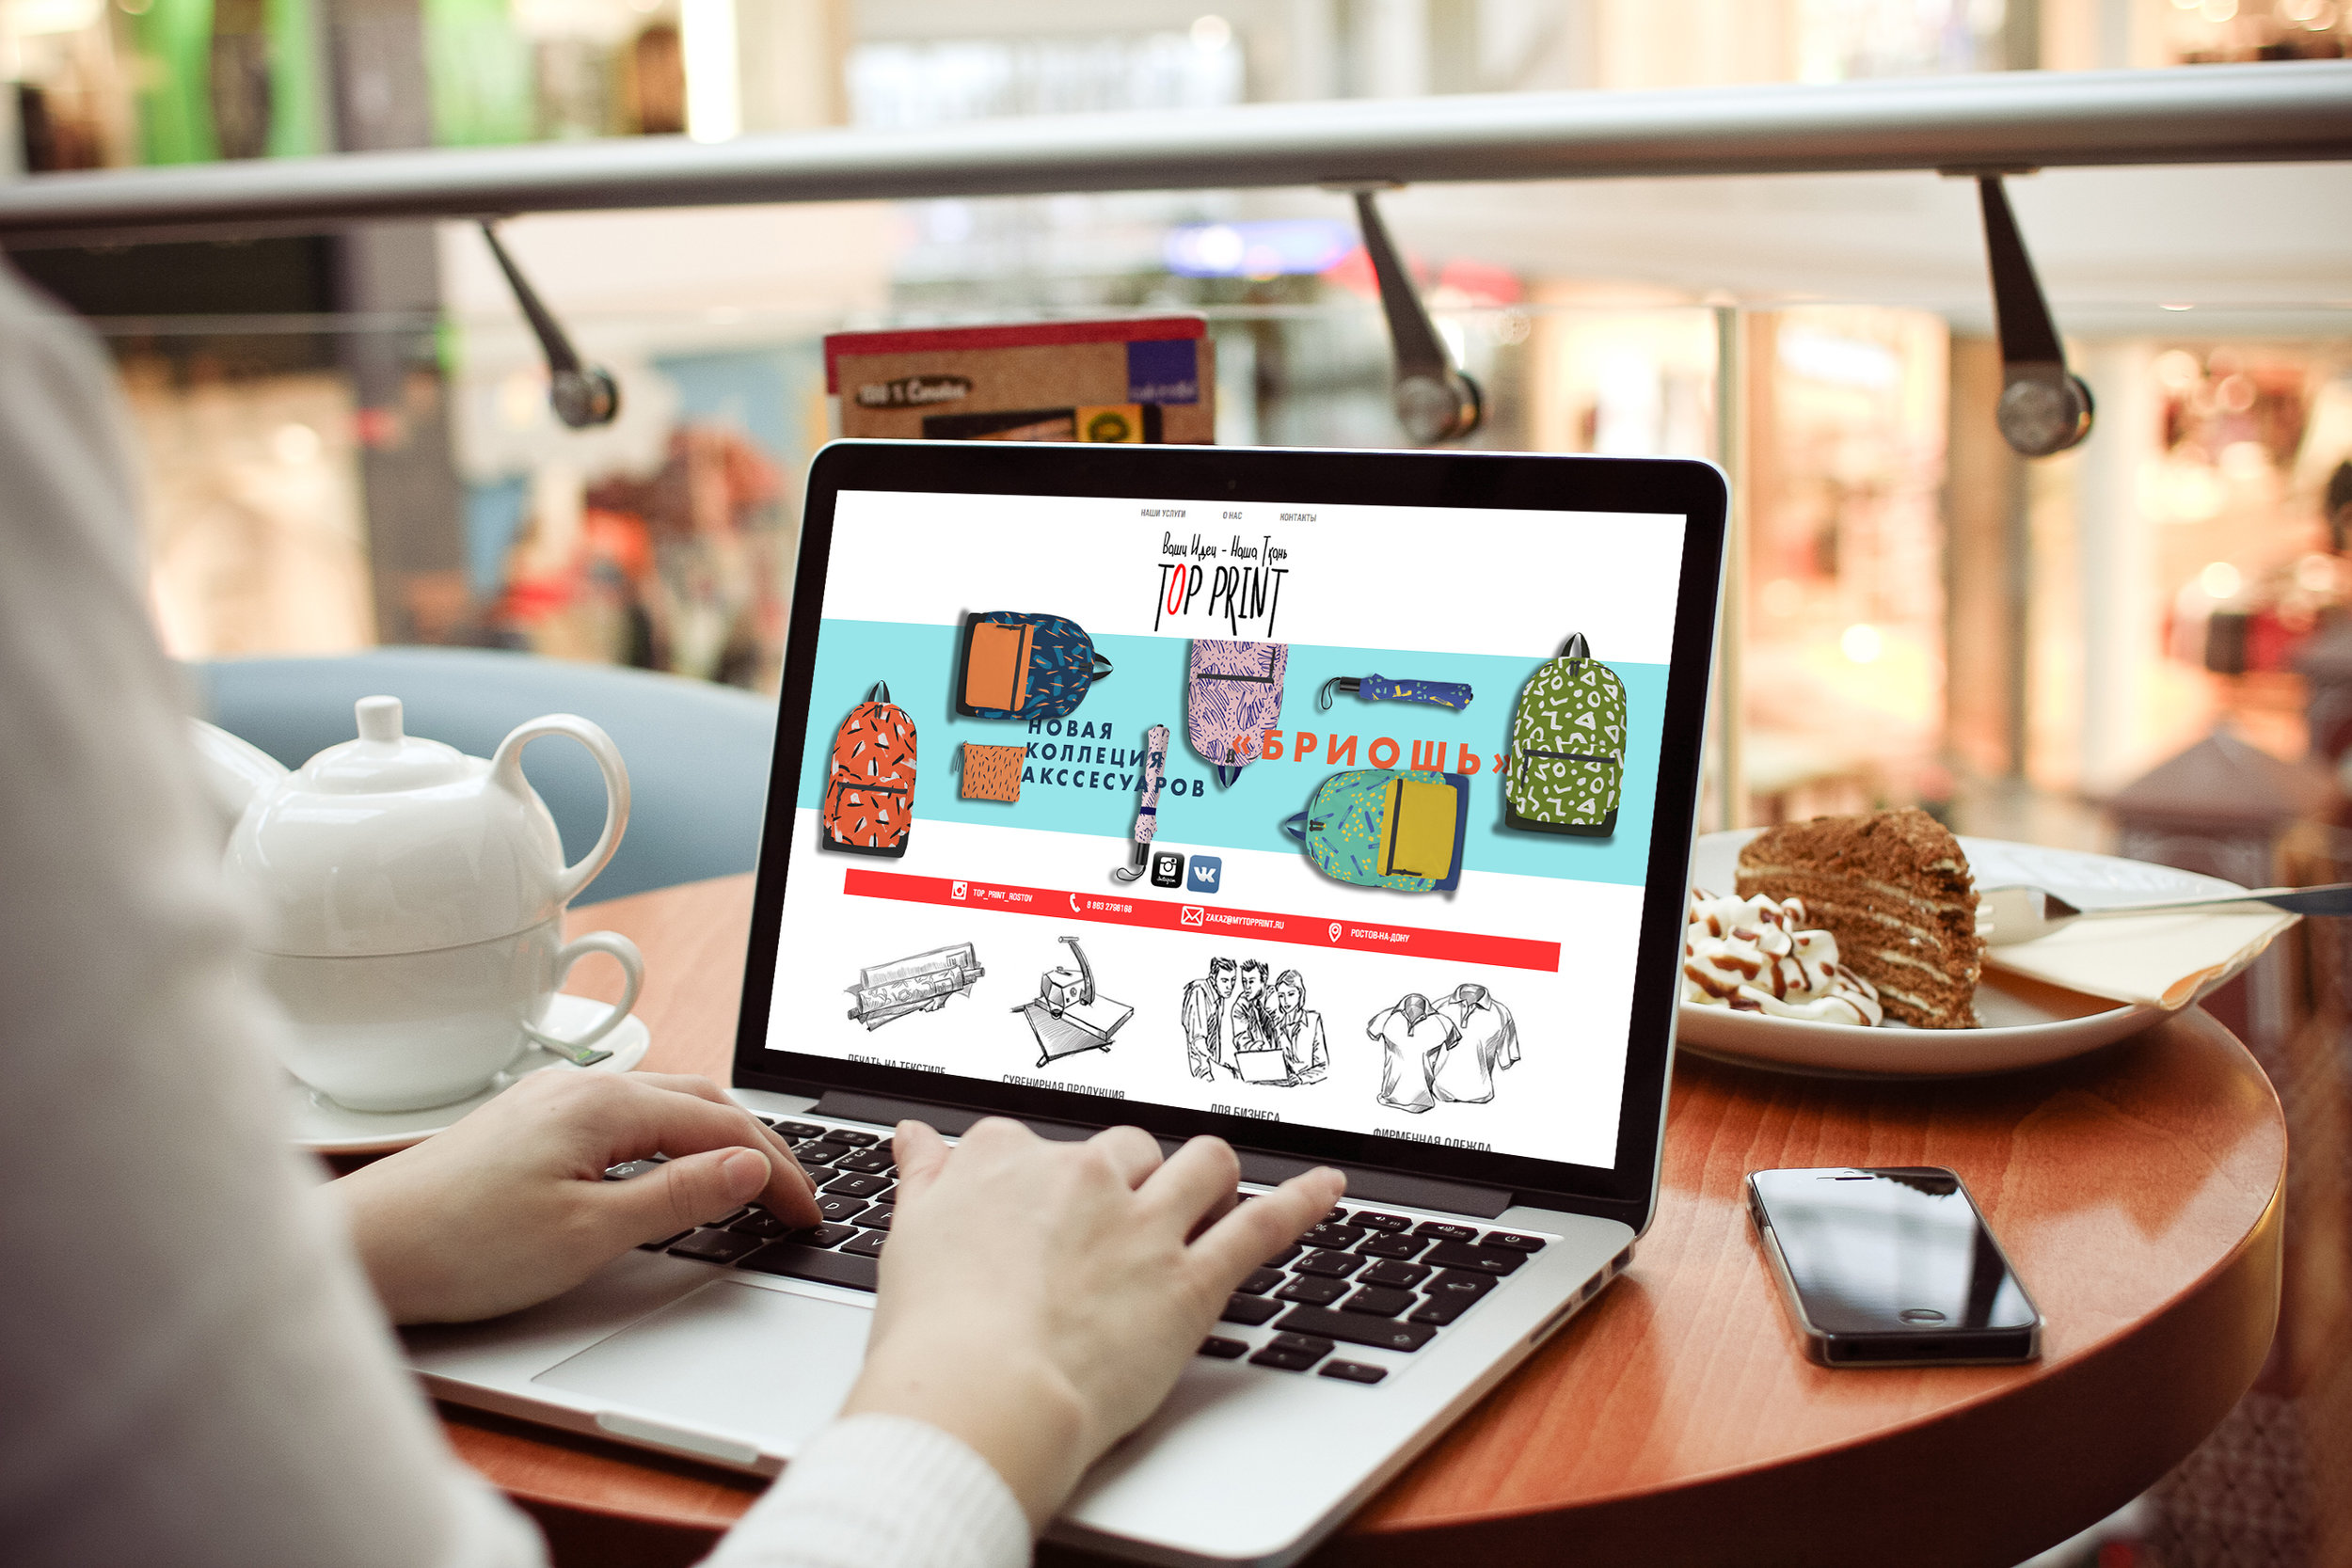 MacBook-Pro-PSD-Mockup11.jpg